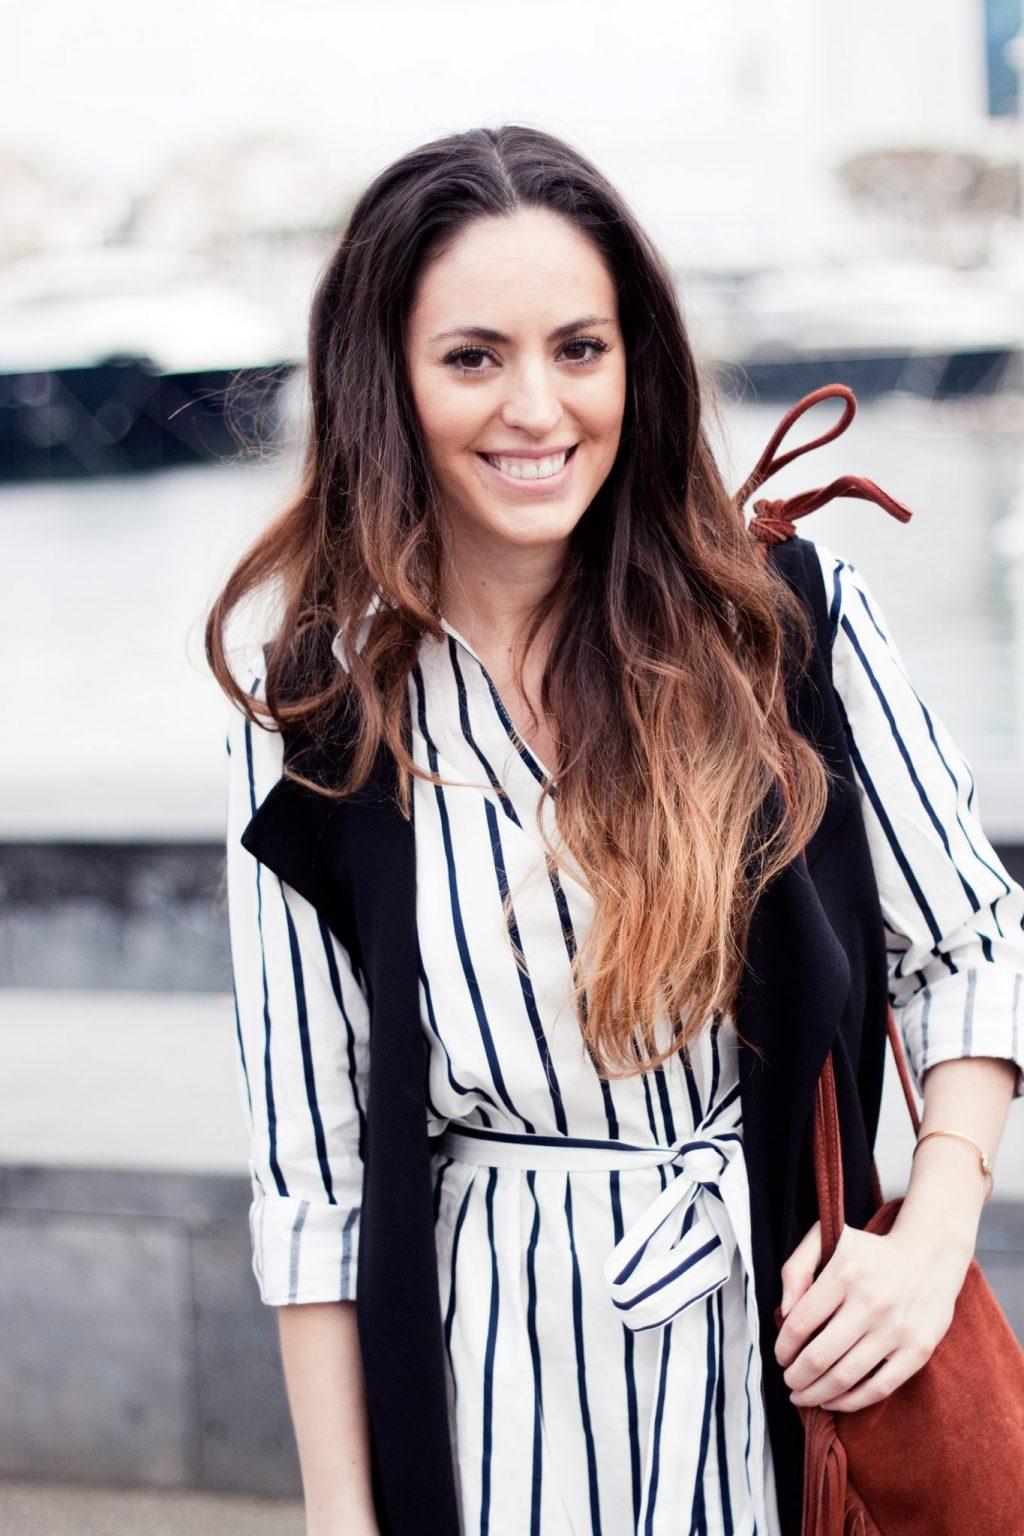 barcelona spain, barcelona, shopbop, long black vest, how to wear a long vest, striped dress, shopbop, fringe bucket bag, fringe crossbody, what to wear in barcelona, barcelona port